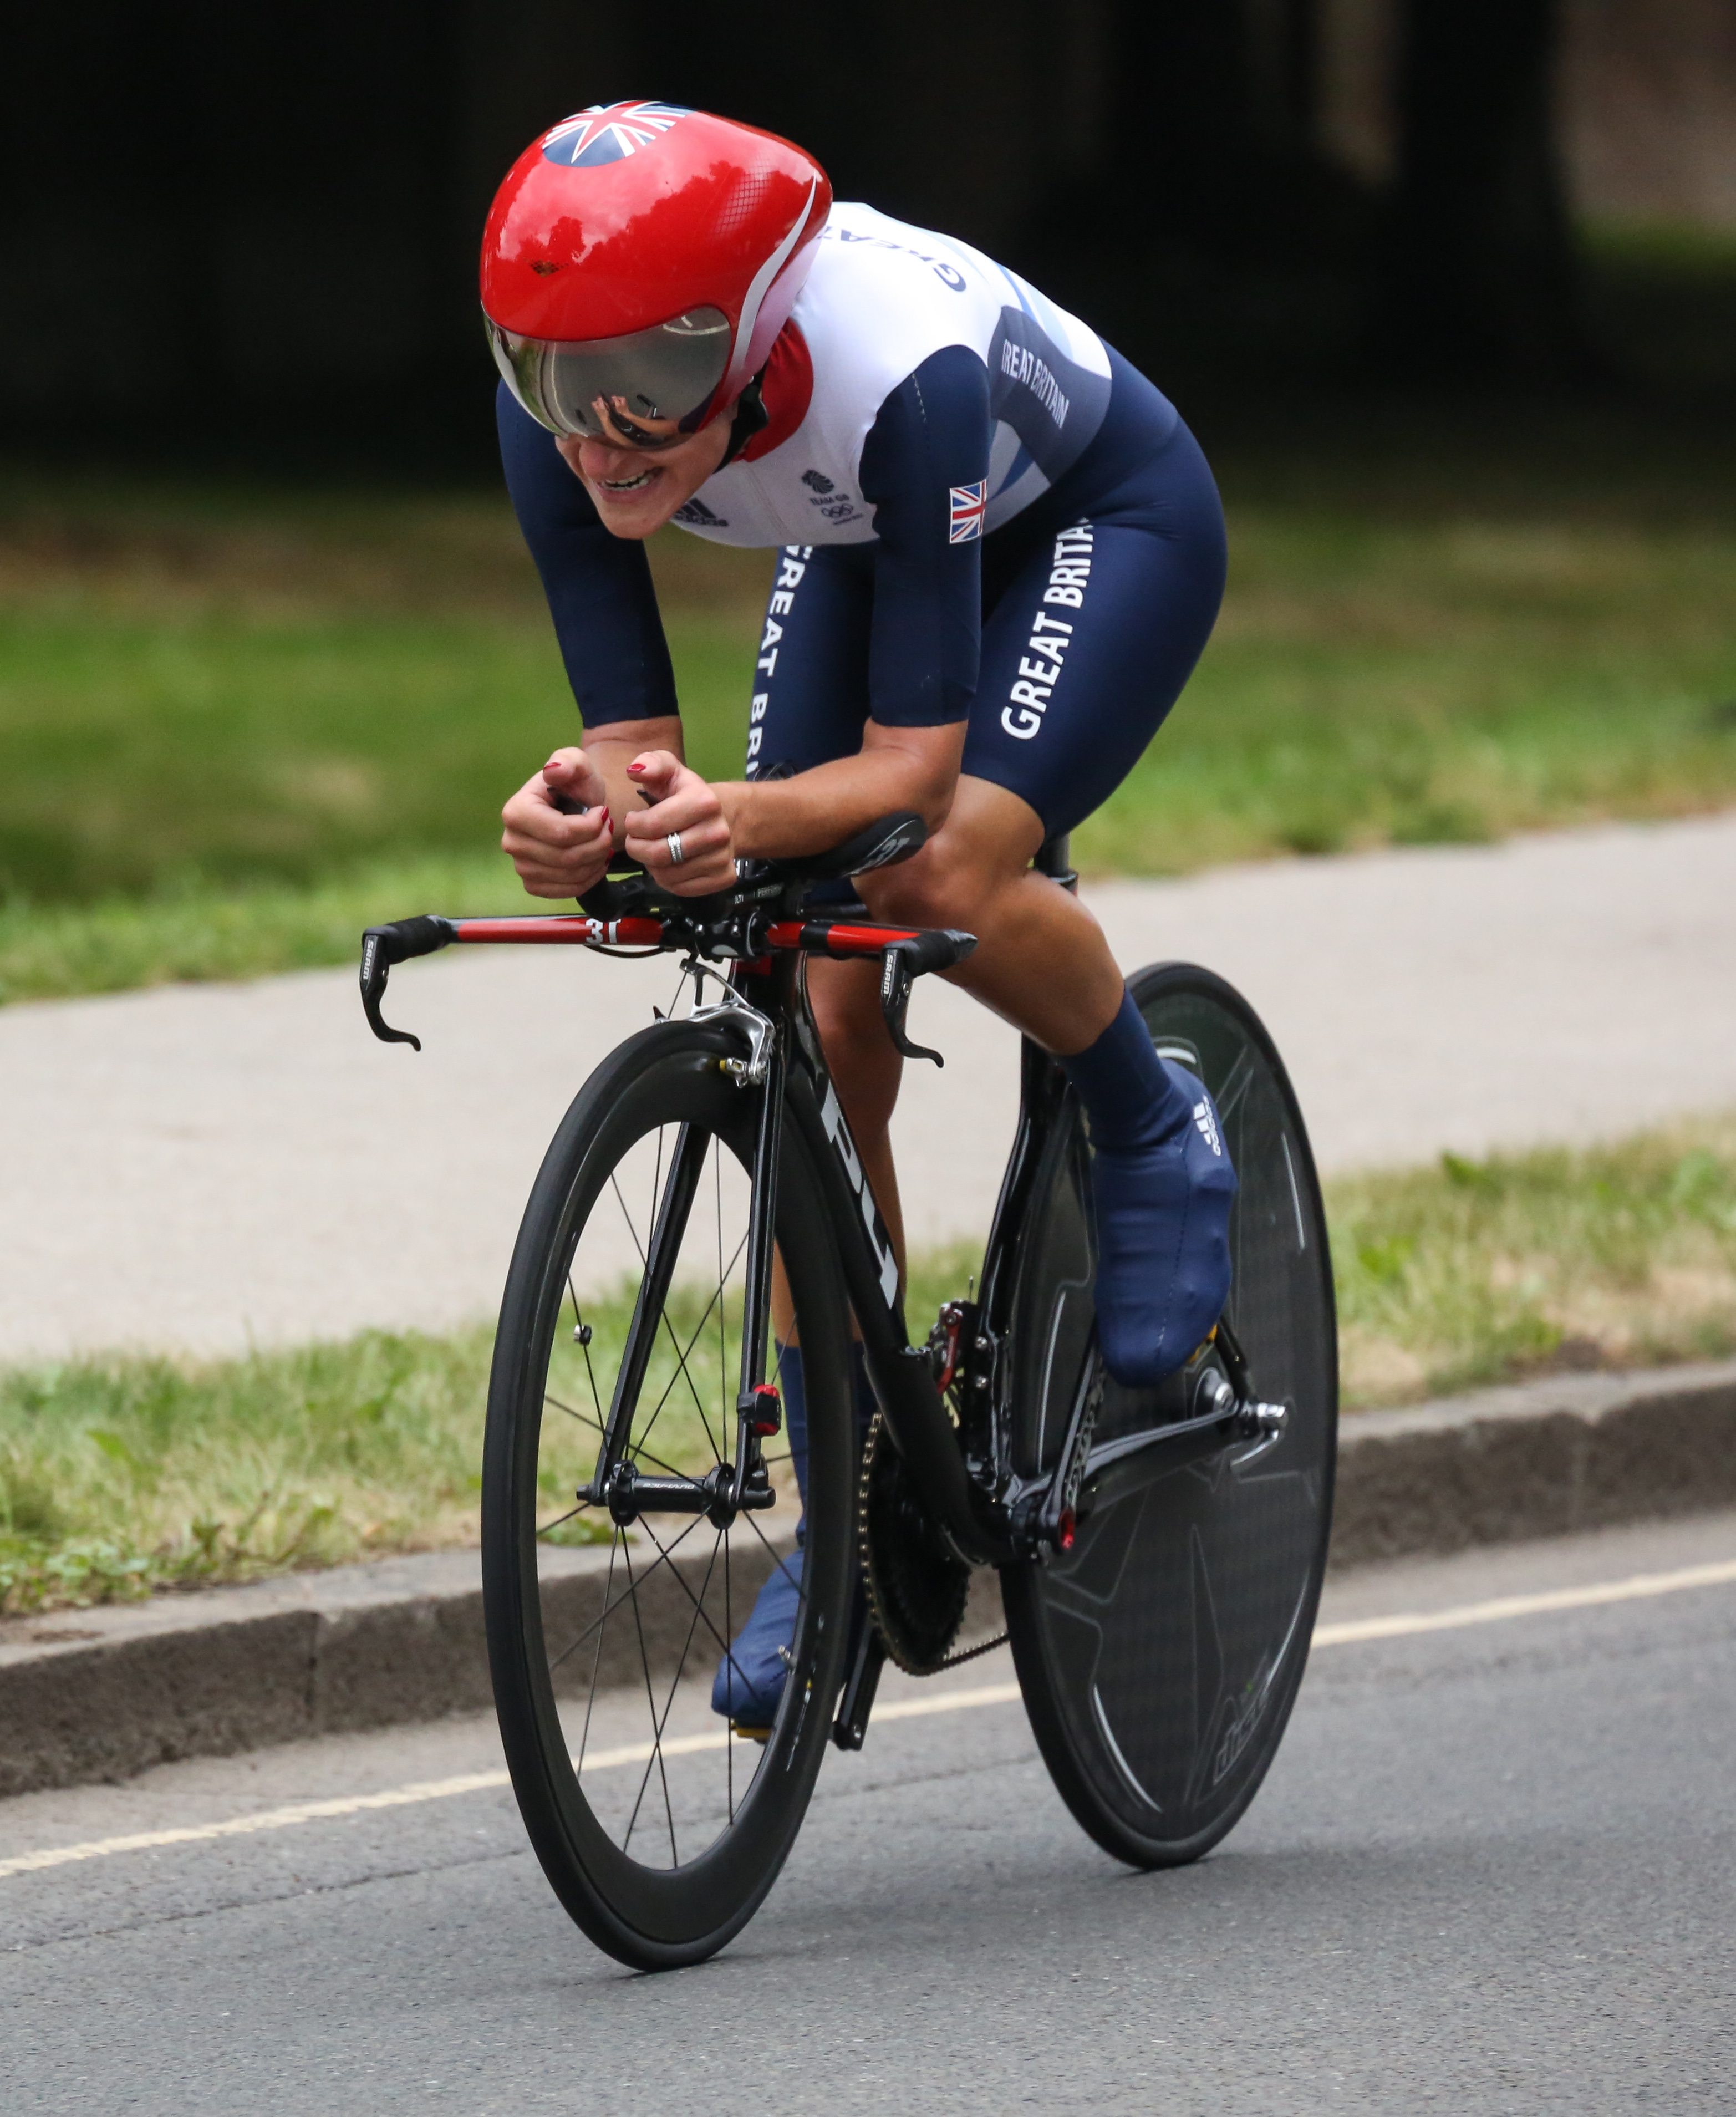 Lizzie Arimtstead - Olympic Cyclist